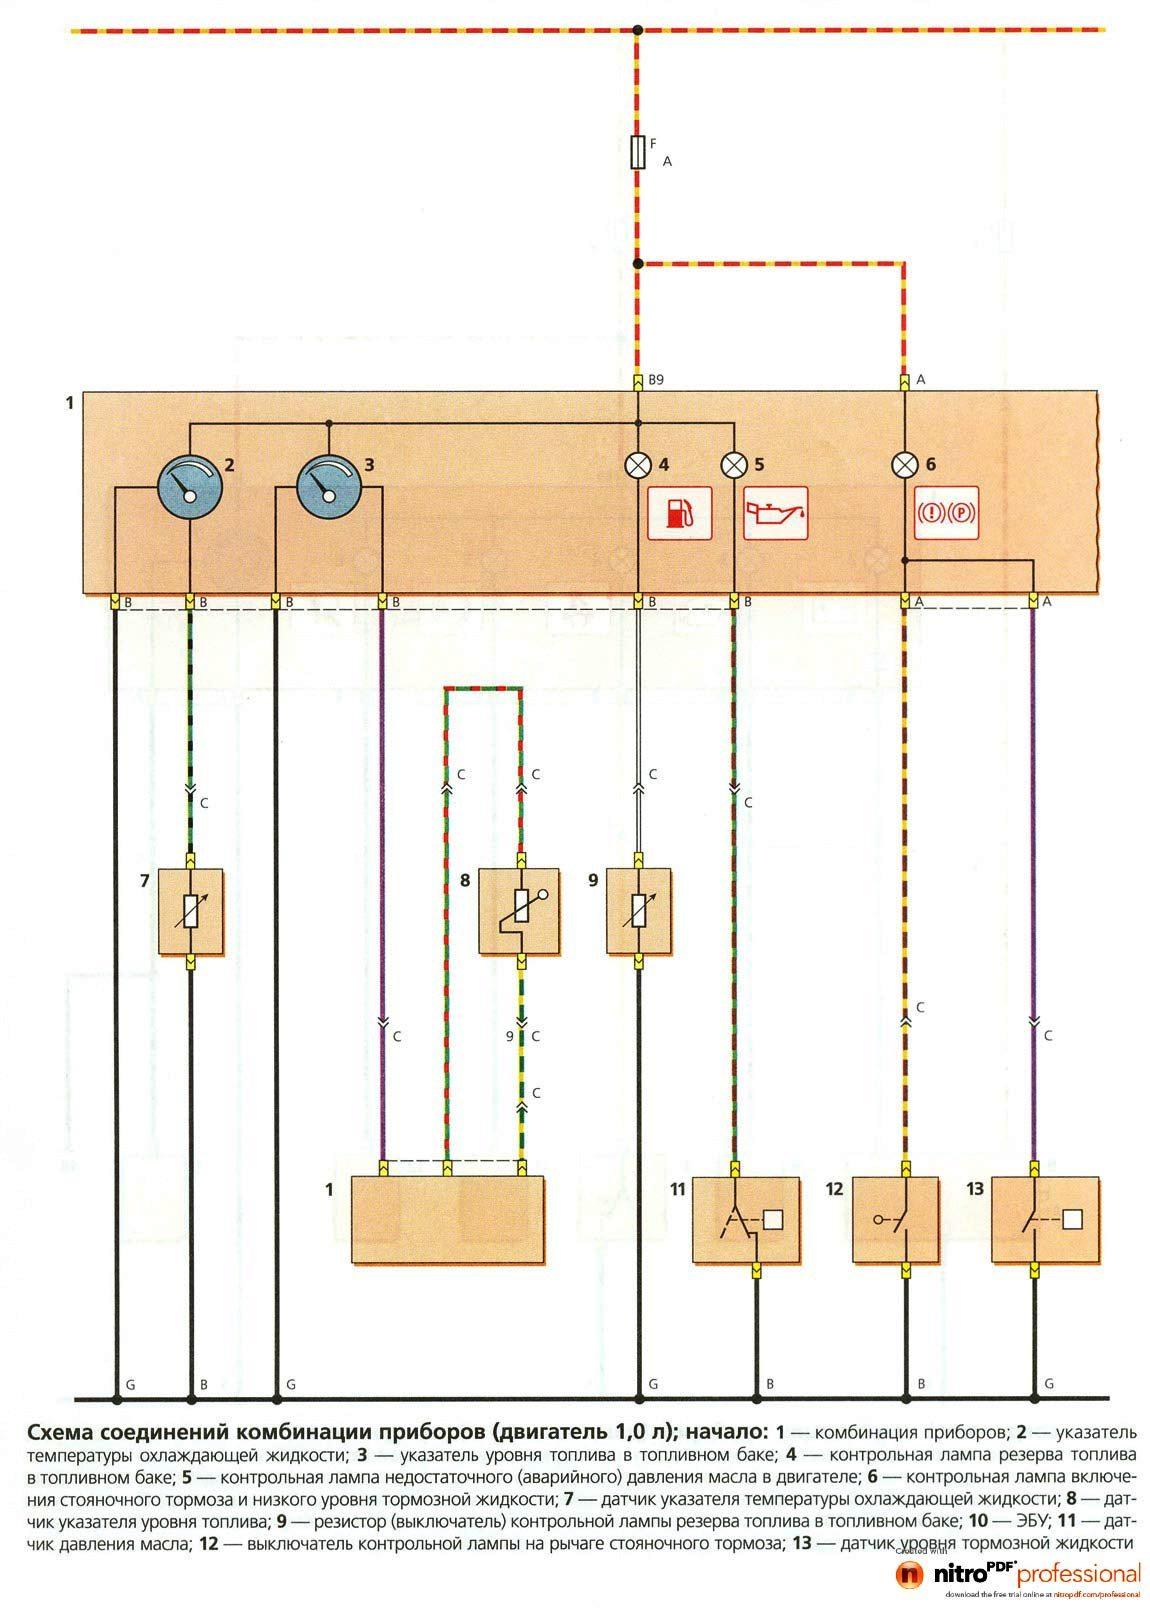 Двигатель матиза схема